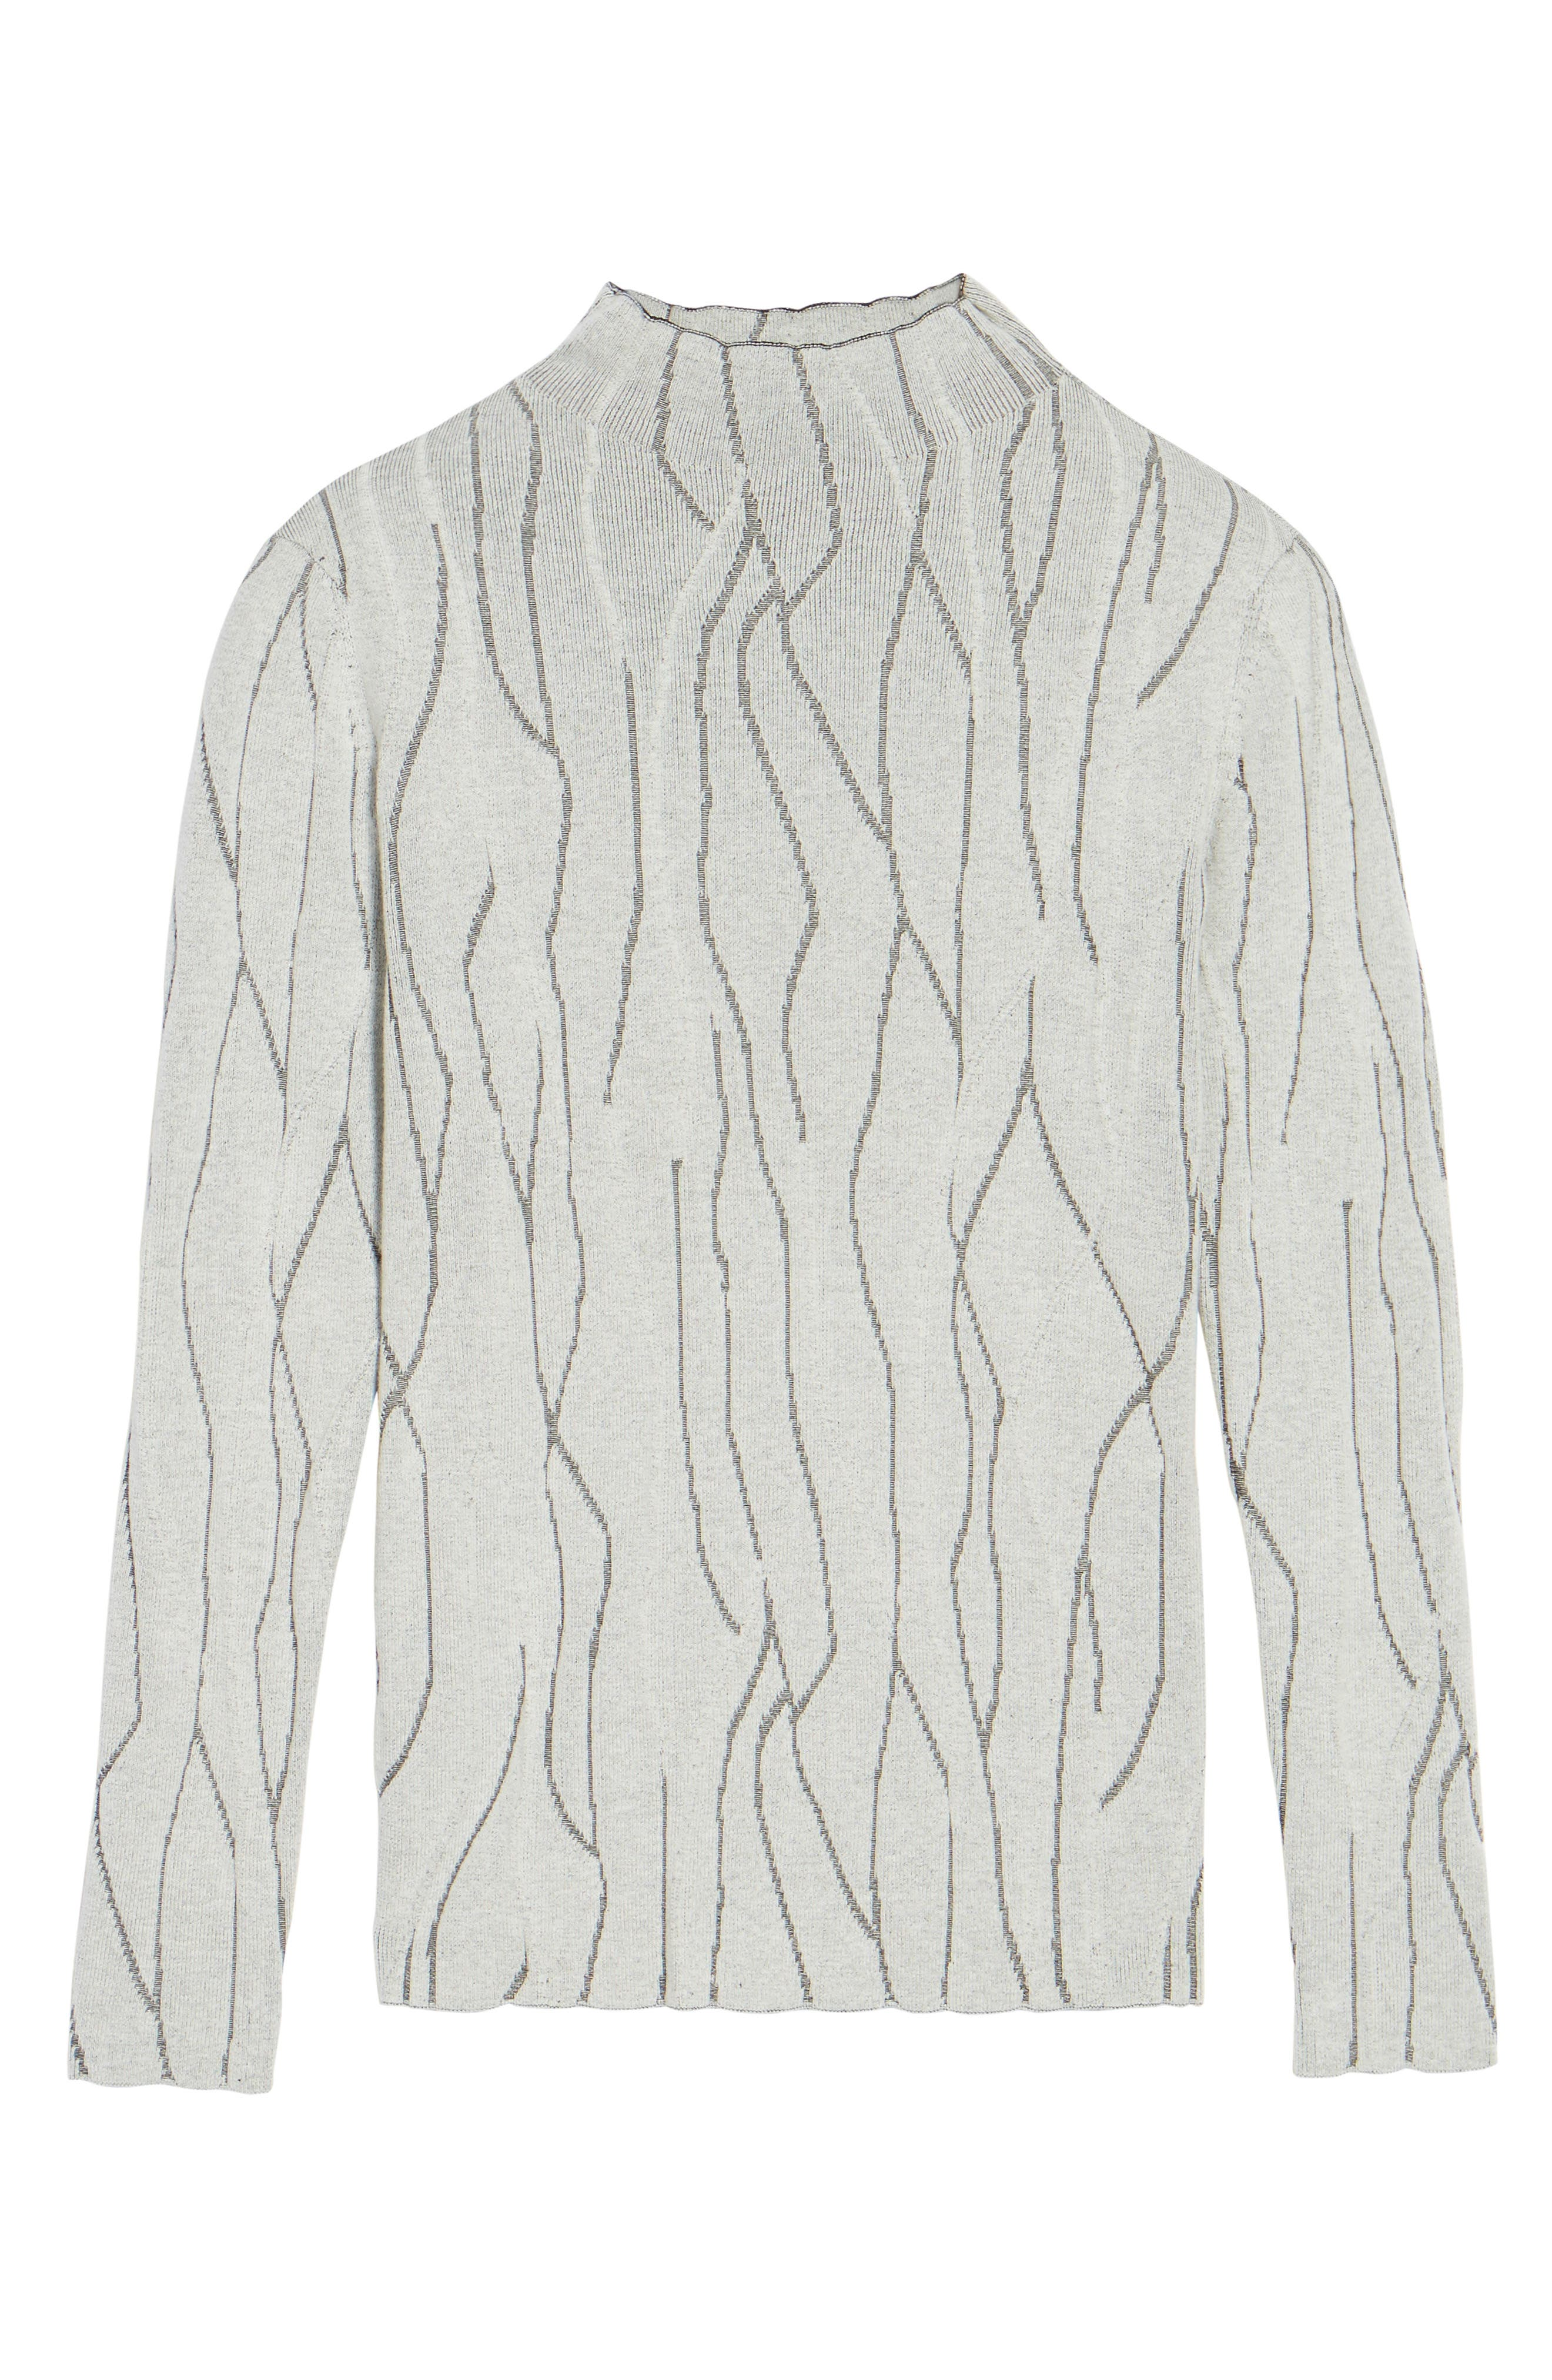 Artisanal Crackle Jacquard Sweater,                             Alternate thumbnail 6, color,                             Chalk